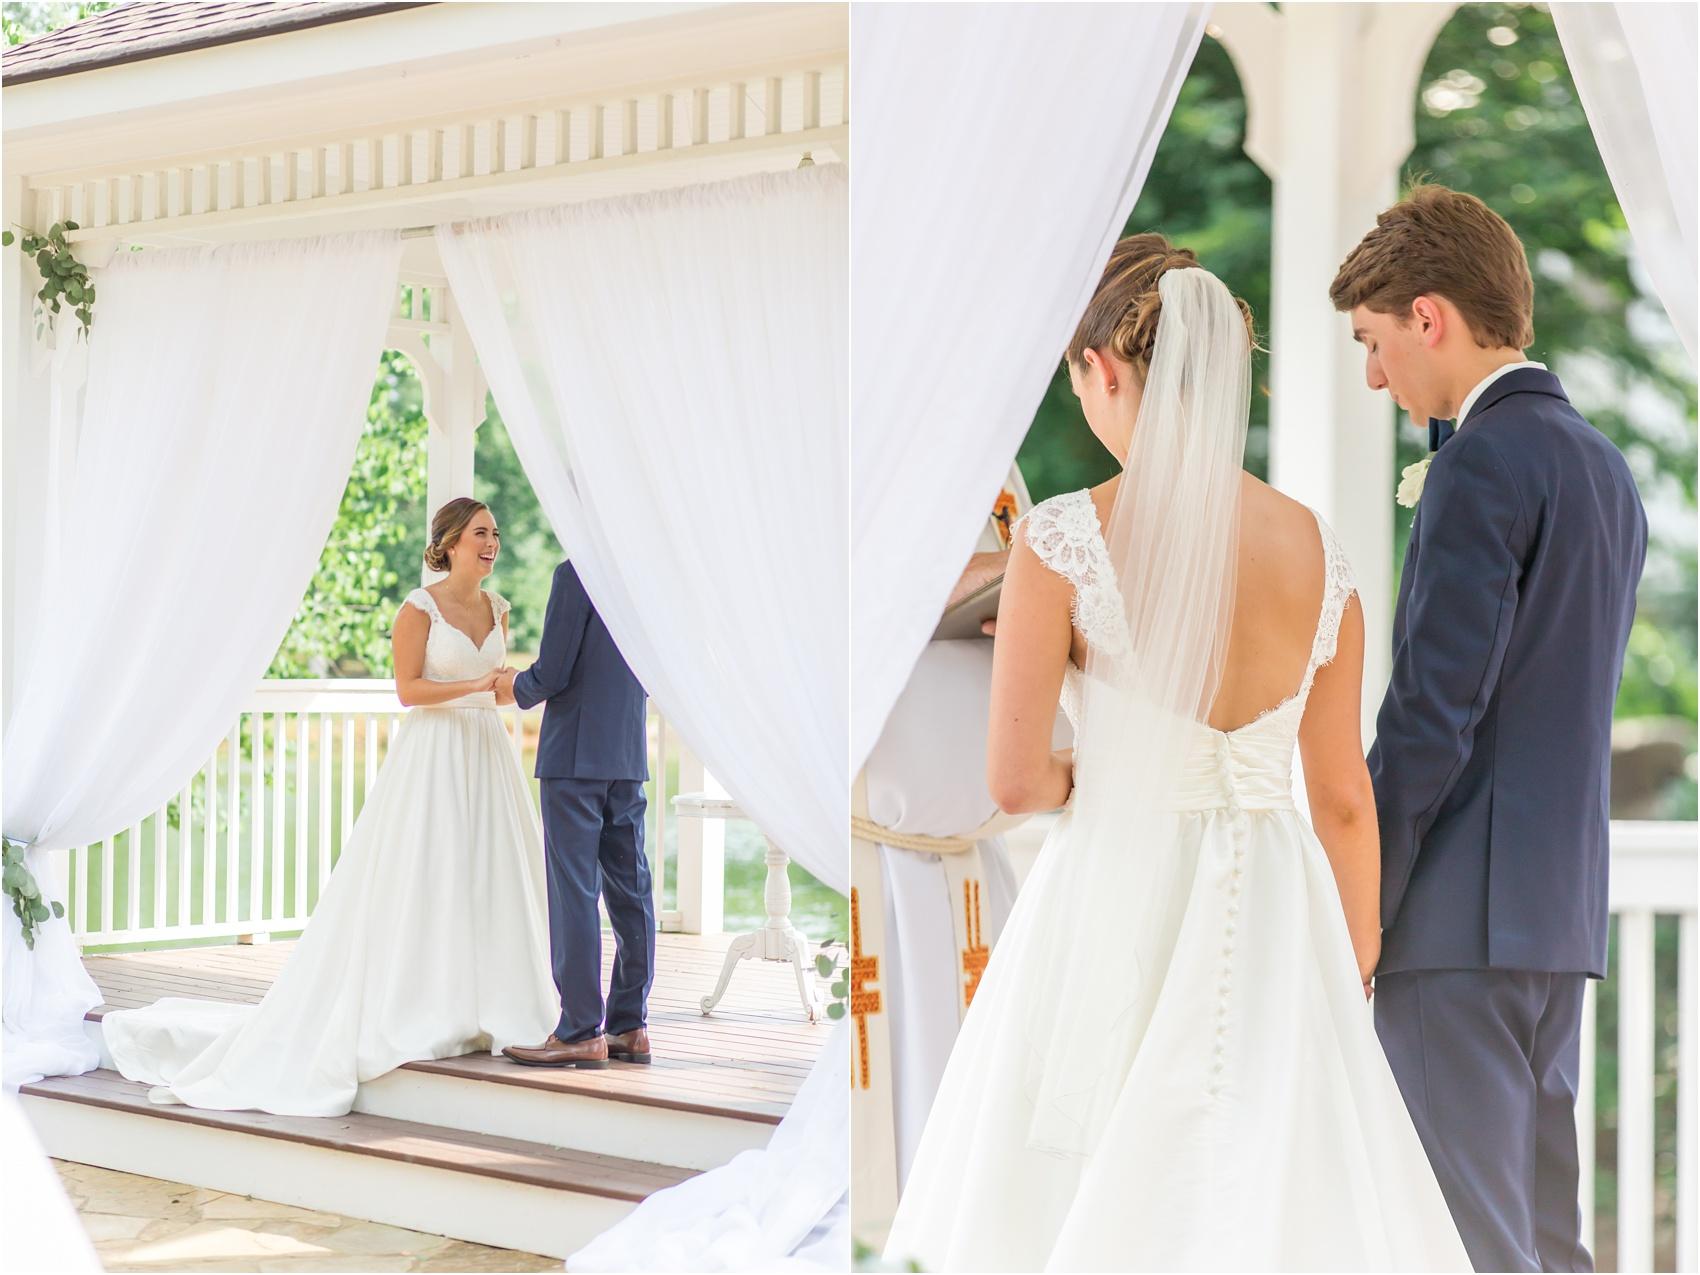 Savannah Eve Photography- Sigl-Adams Wedding- Sneak Peek-38.jpg